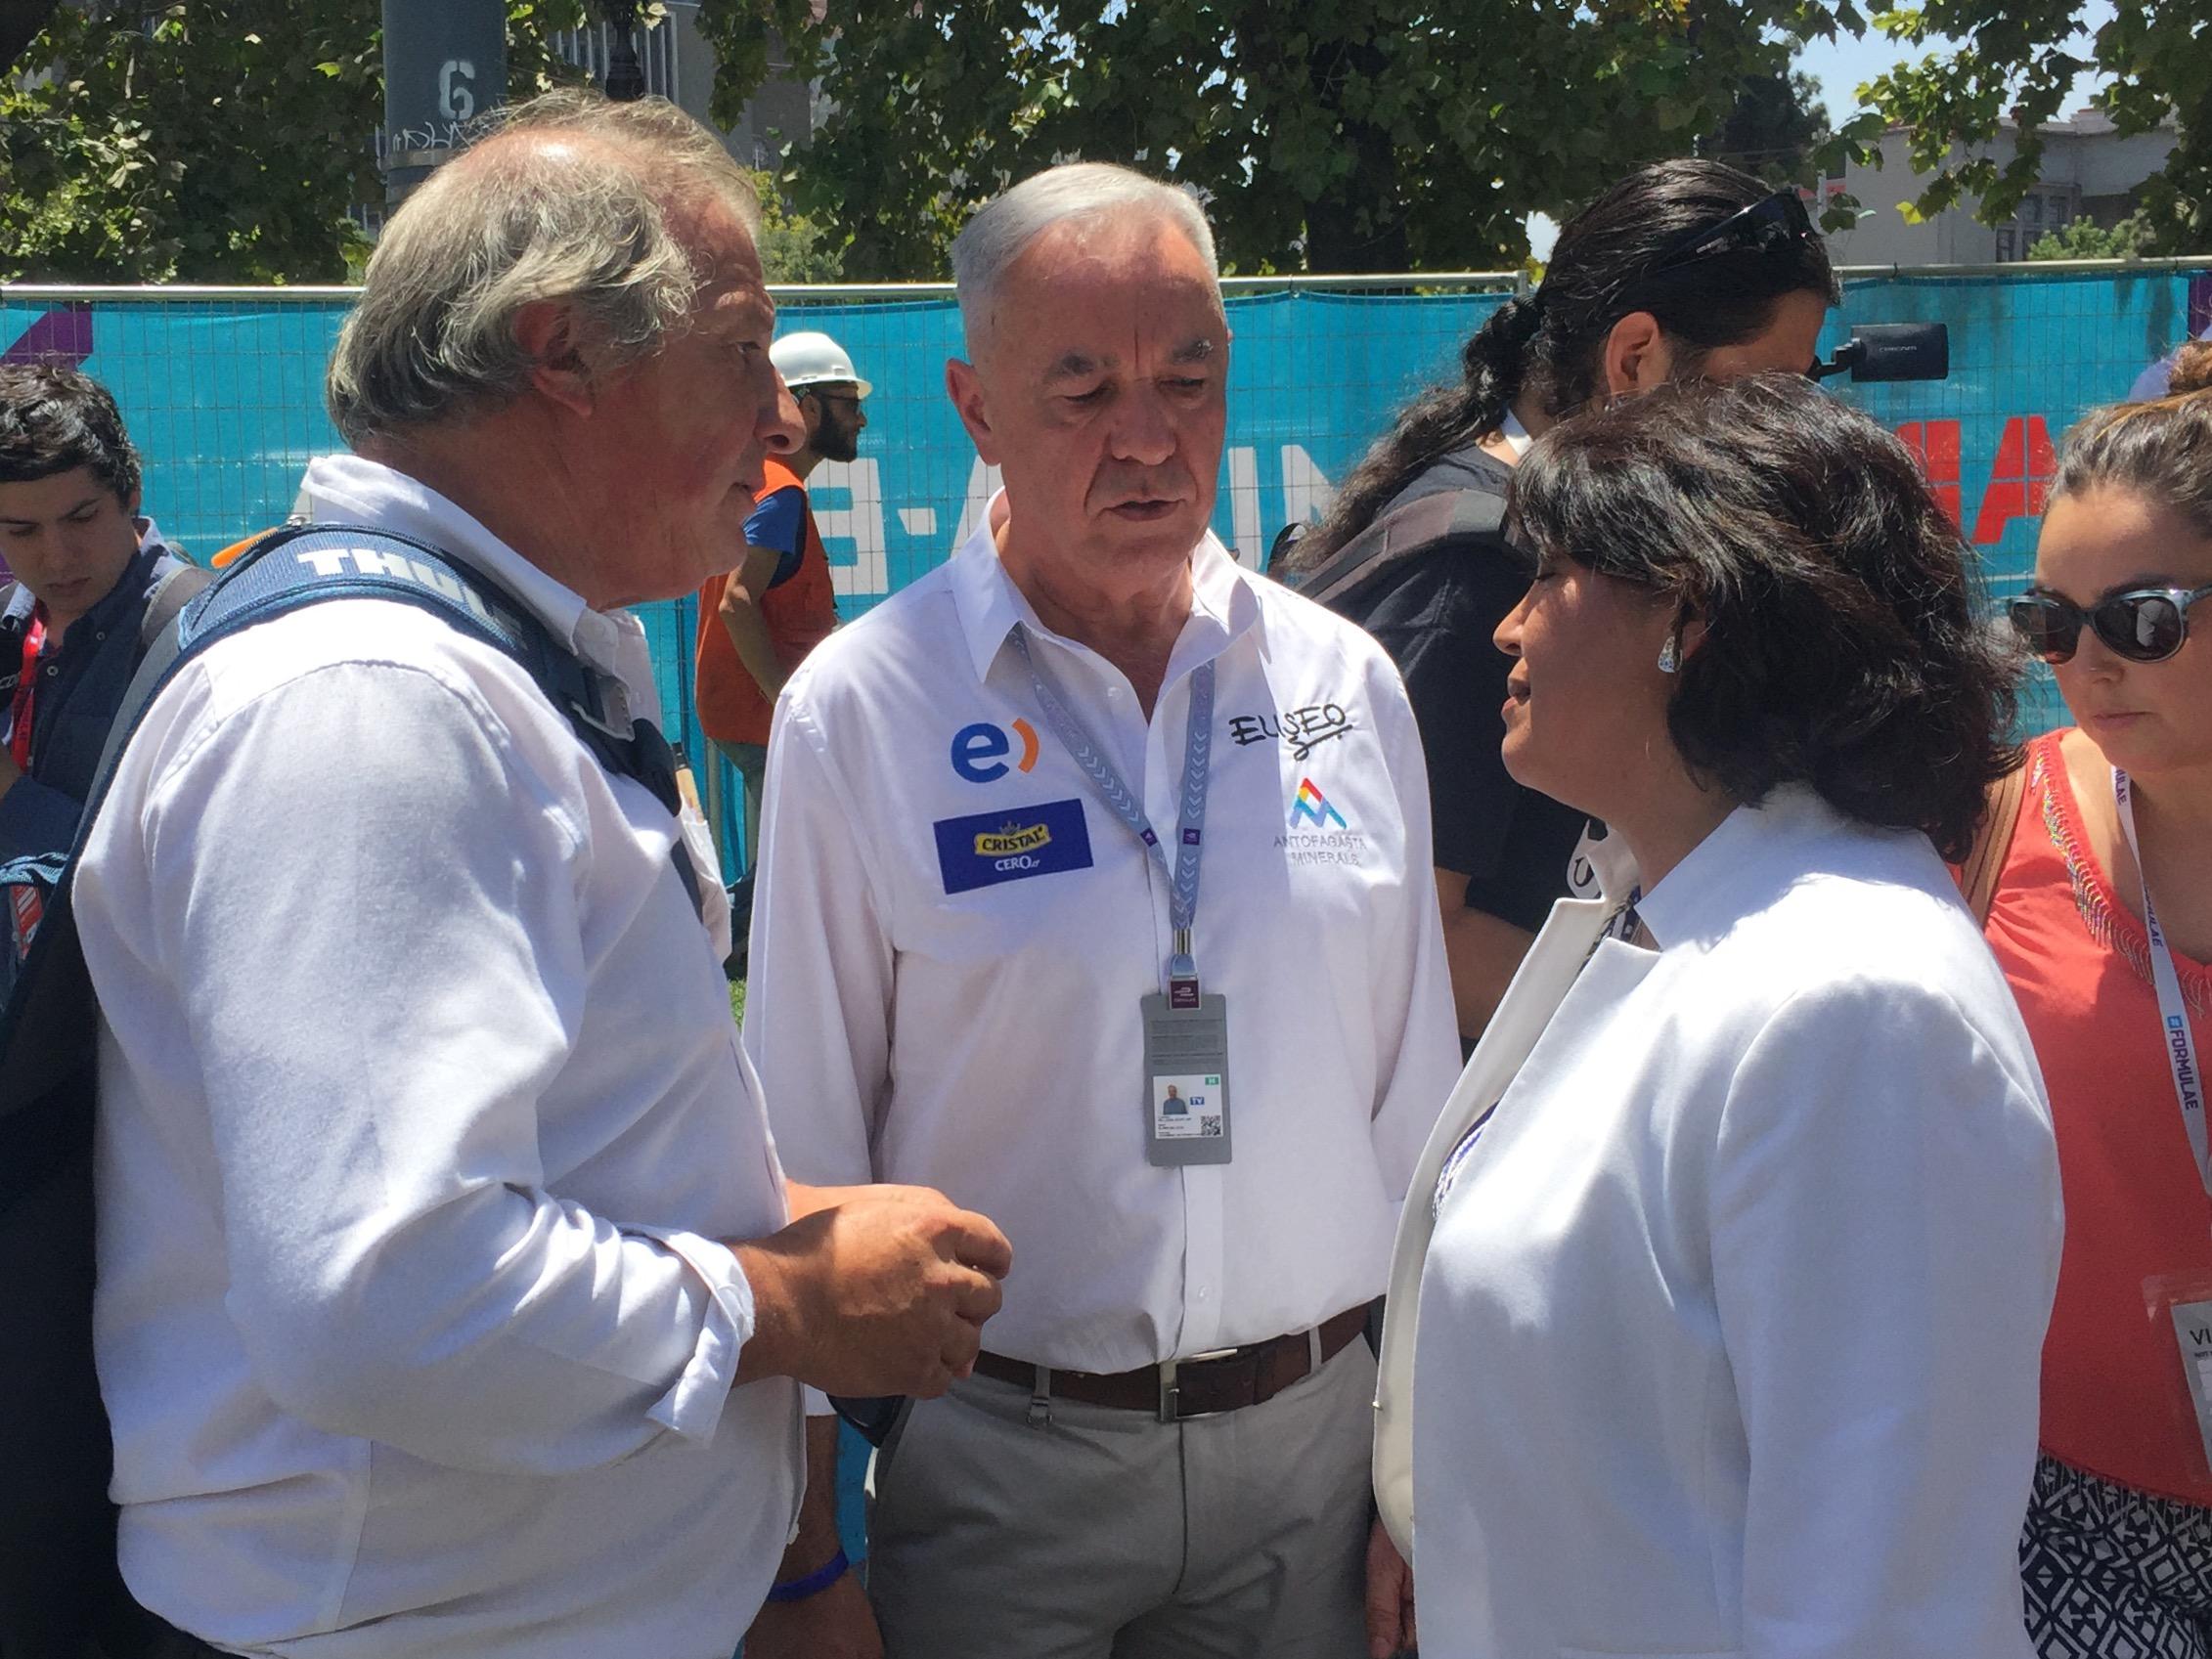 Senadora electa Yasna Provoste se reúne con organizadores de la Fórmula E en Chile y evalúan realizar corrida en Atacama